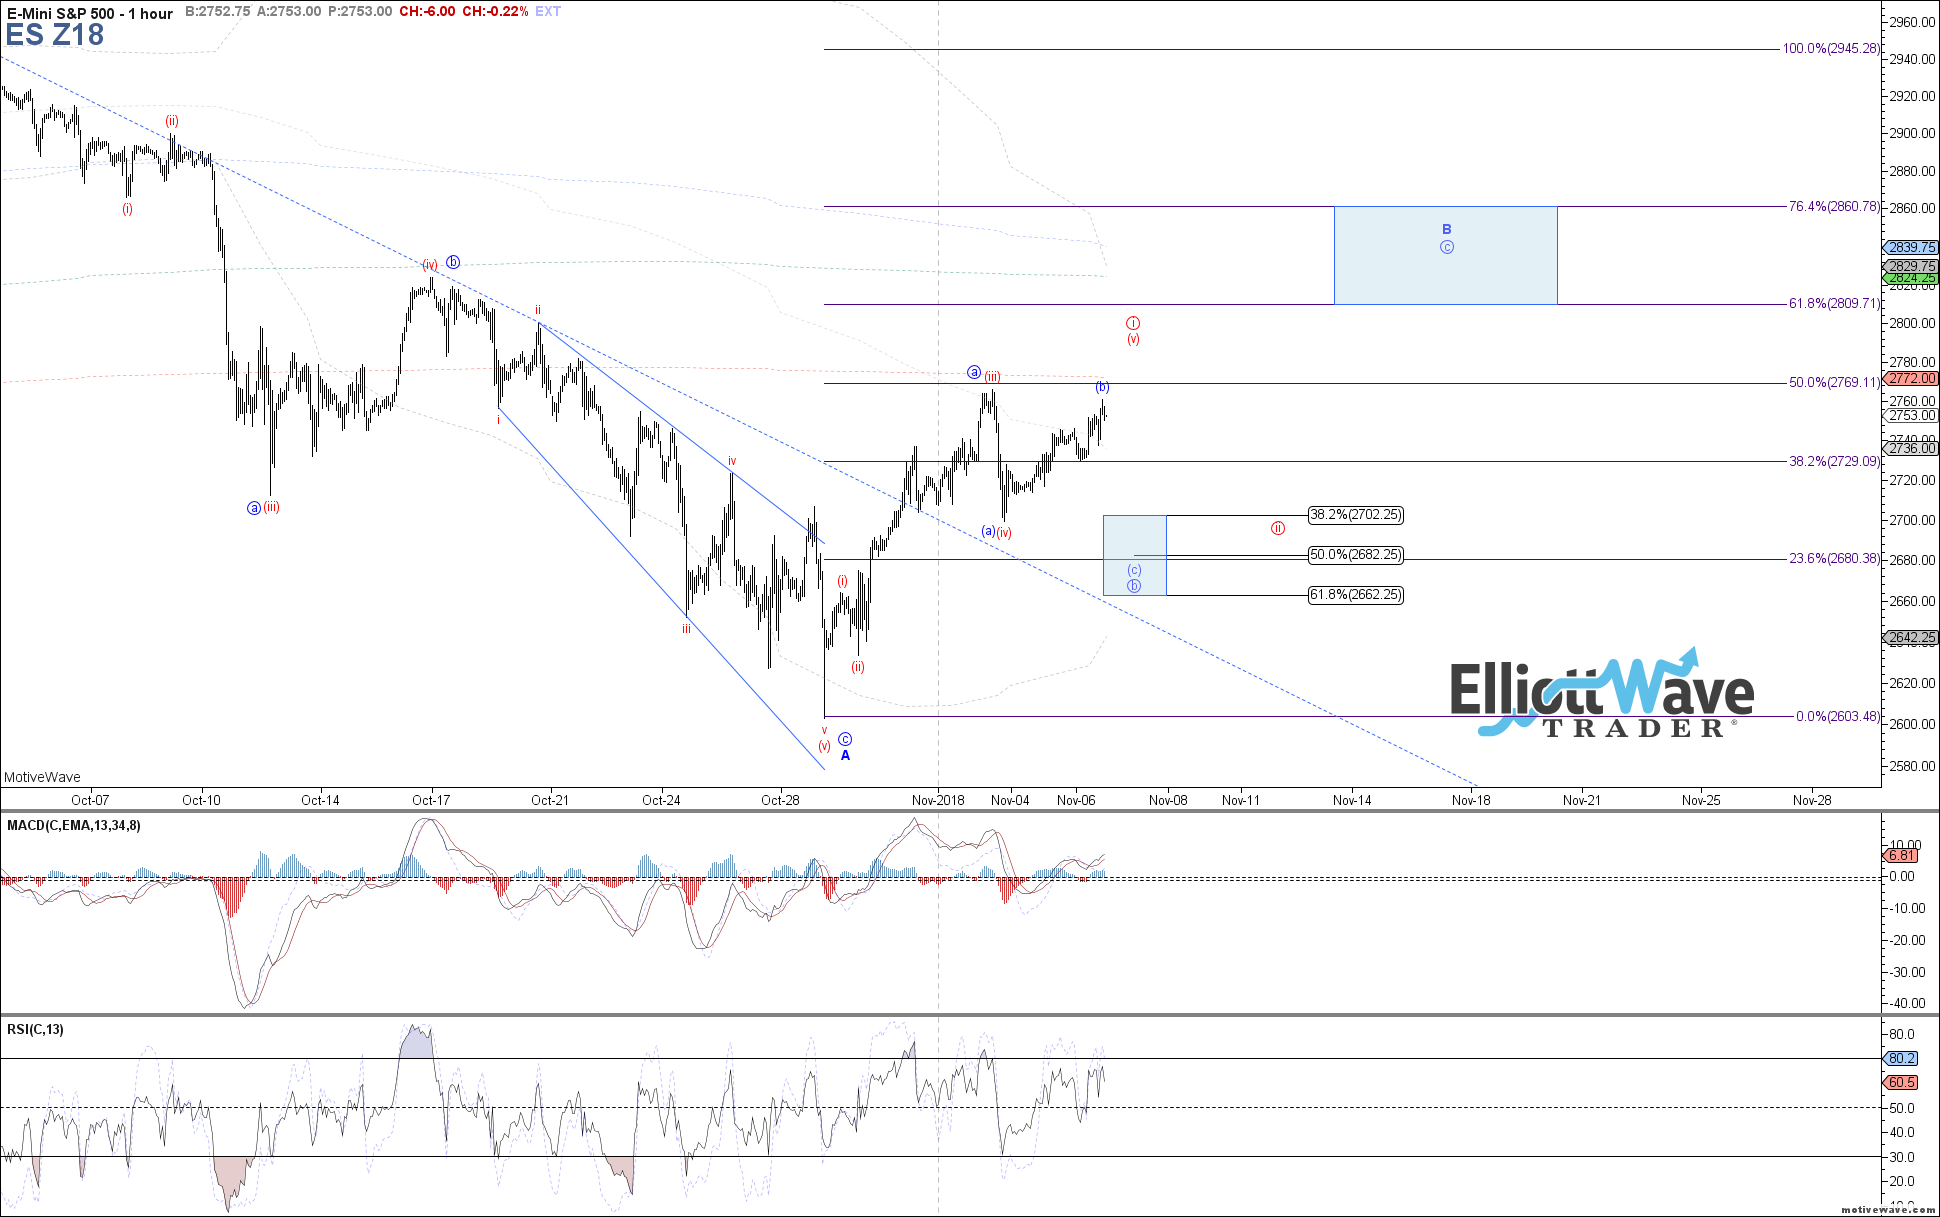 ES - Elliott Wave Chart Analysis on Nov 6th, 2018